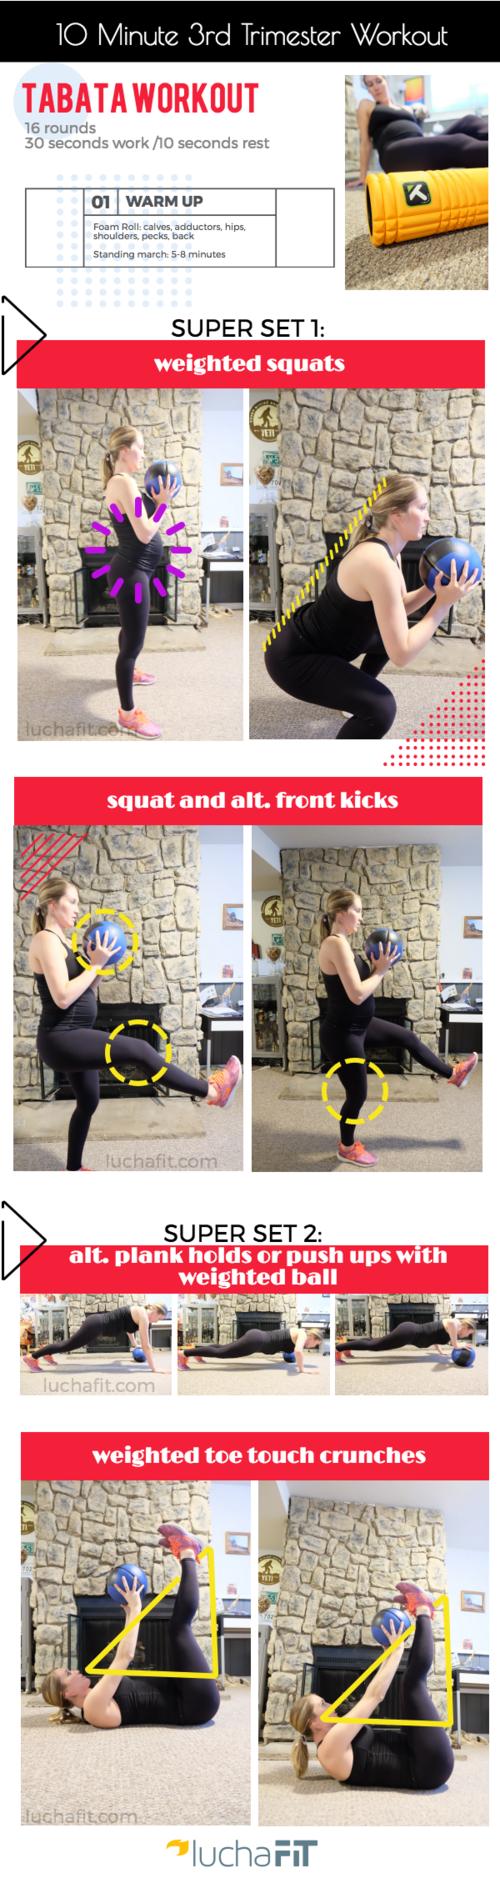 Strength Training Exam Weightlifting Flashcards Quizlet >> Lifestyle Blog Luchafit Luchafit